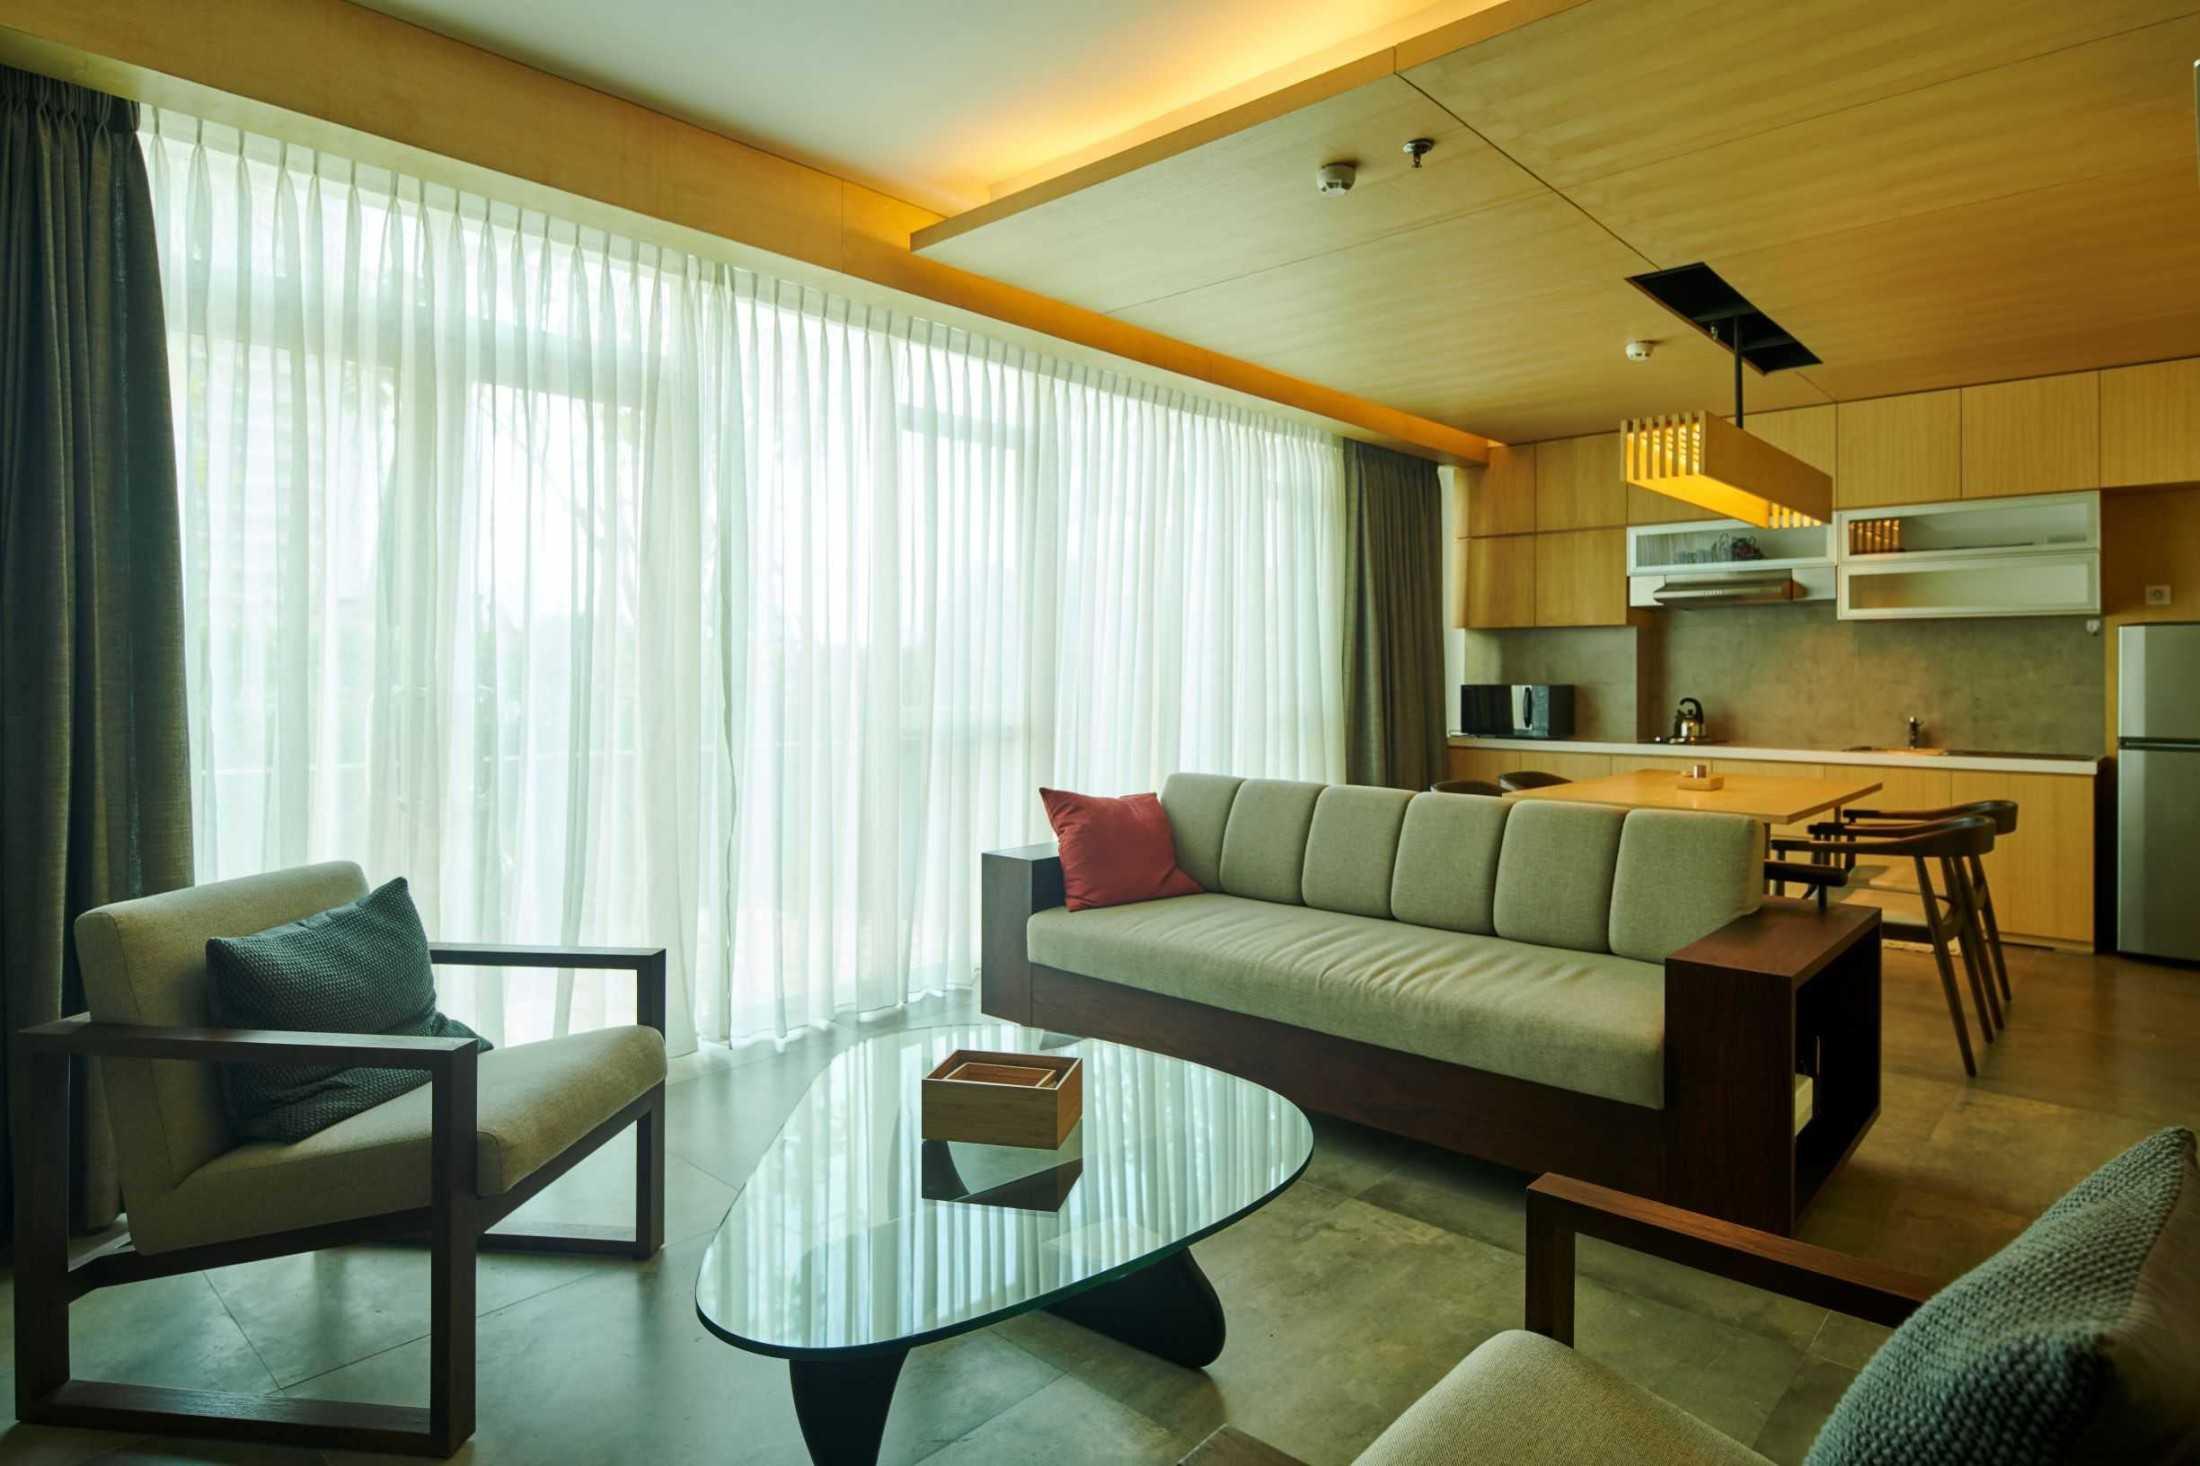 Hadivincent Architects Tb Apartment Lippo Cikarang, Bekasi, Jawa Barat, Indonesia Lippo Cikarang, Bekasi, Jawa Barat, Indonesia Hadi-Vincent-Architects-Tb-Apartment  70995